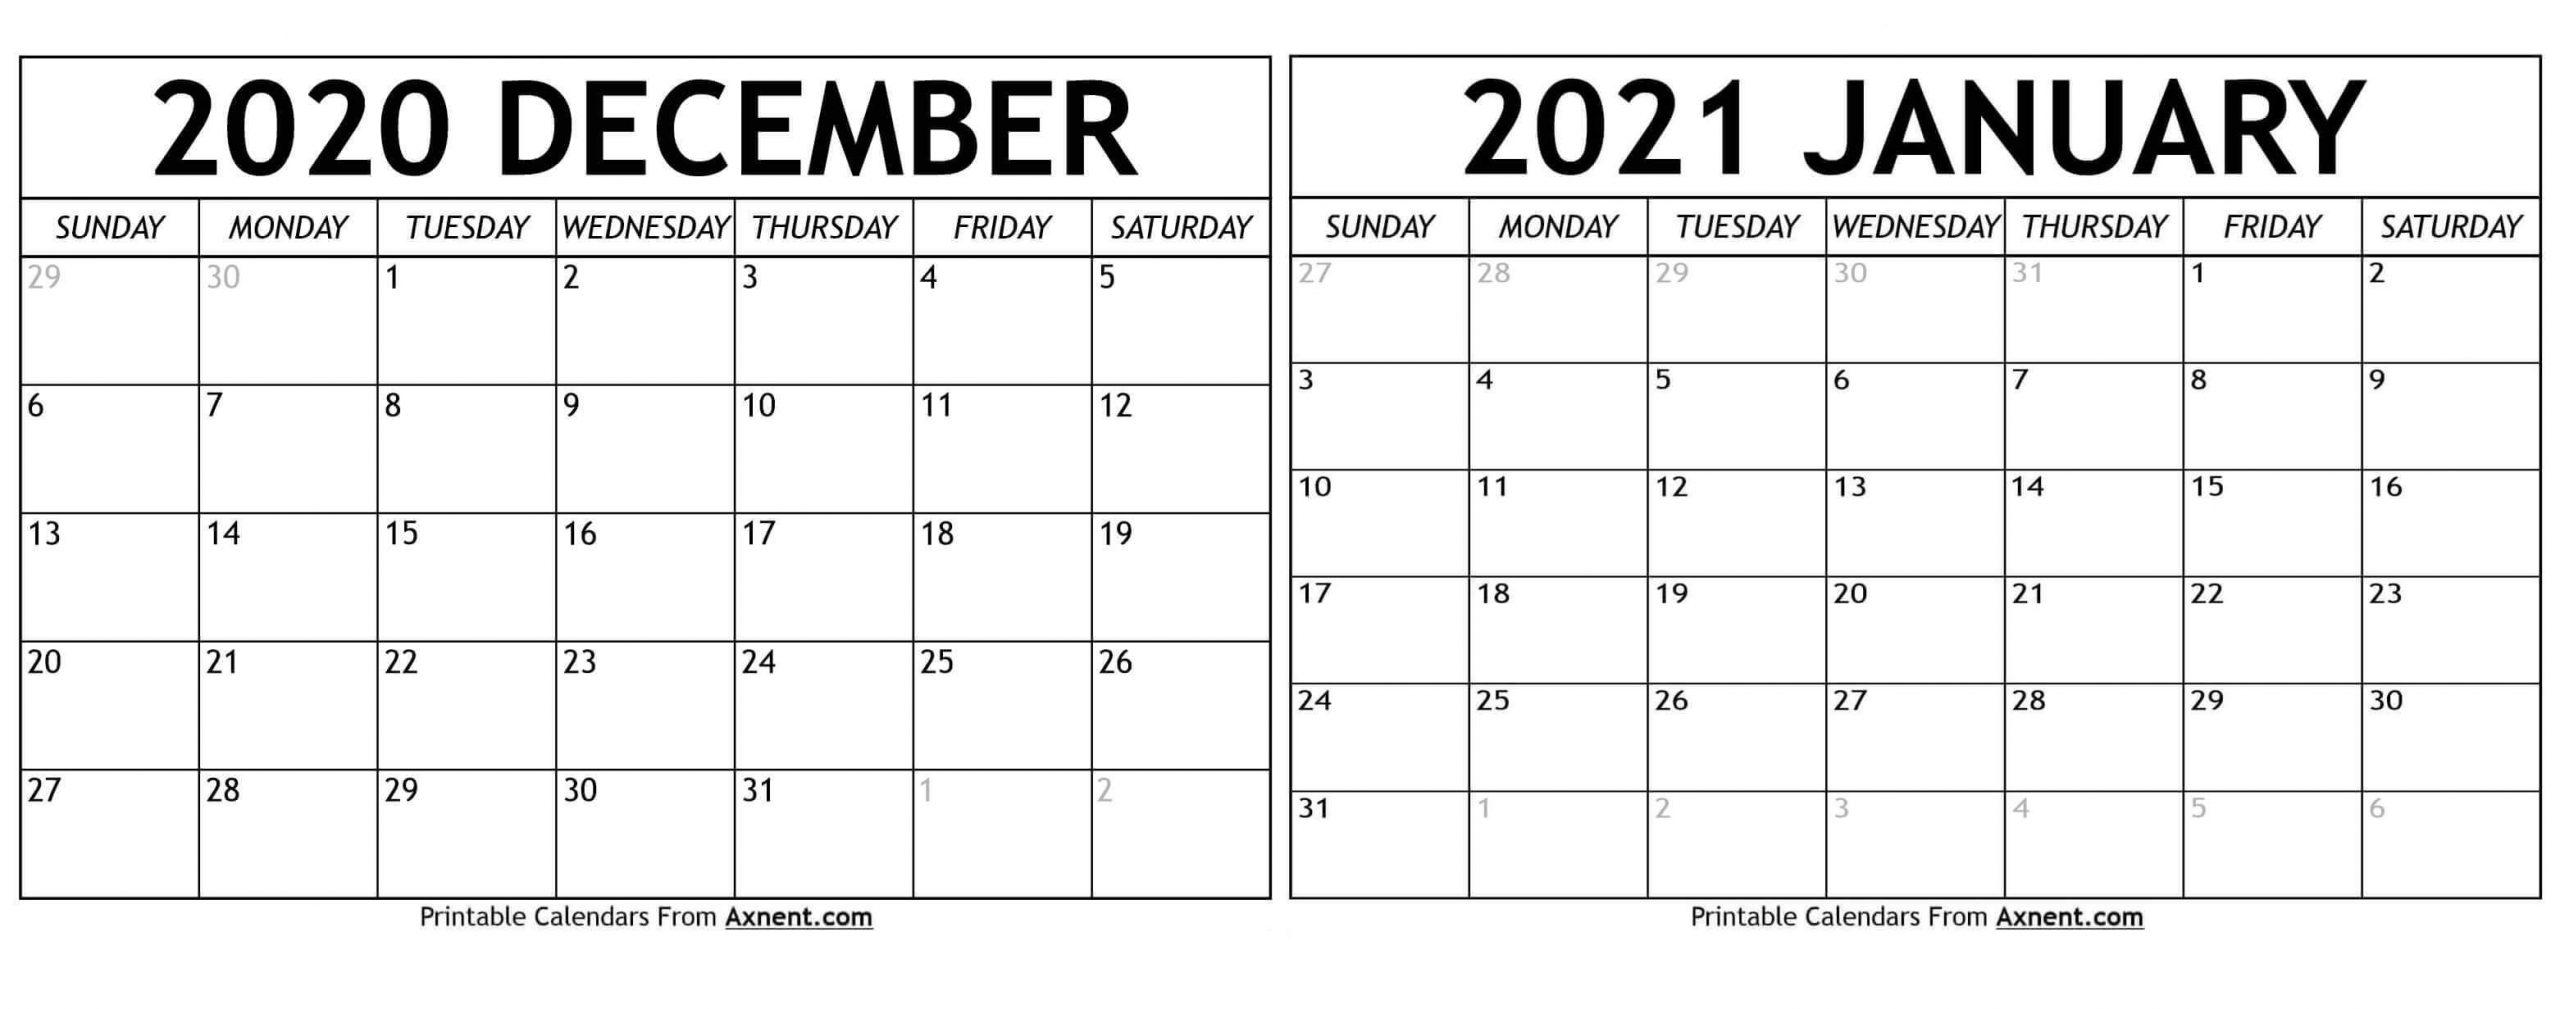 December 2020 January 2021 Calendar Template - Time